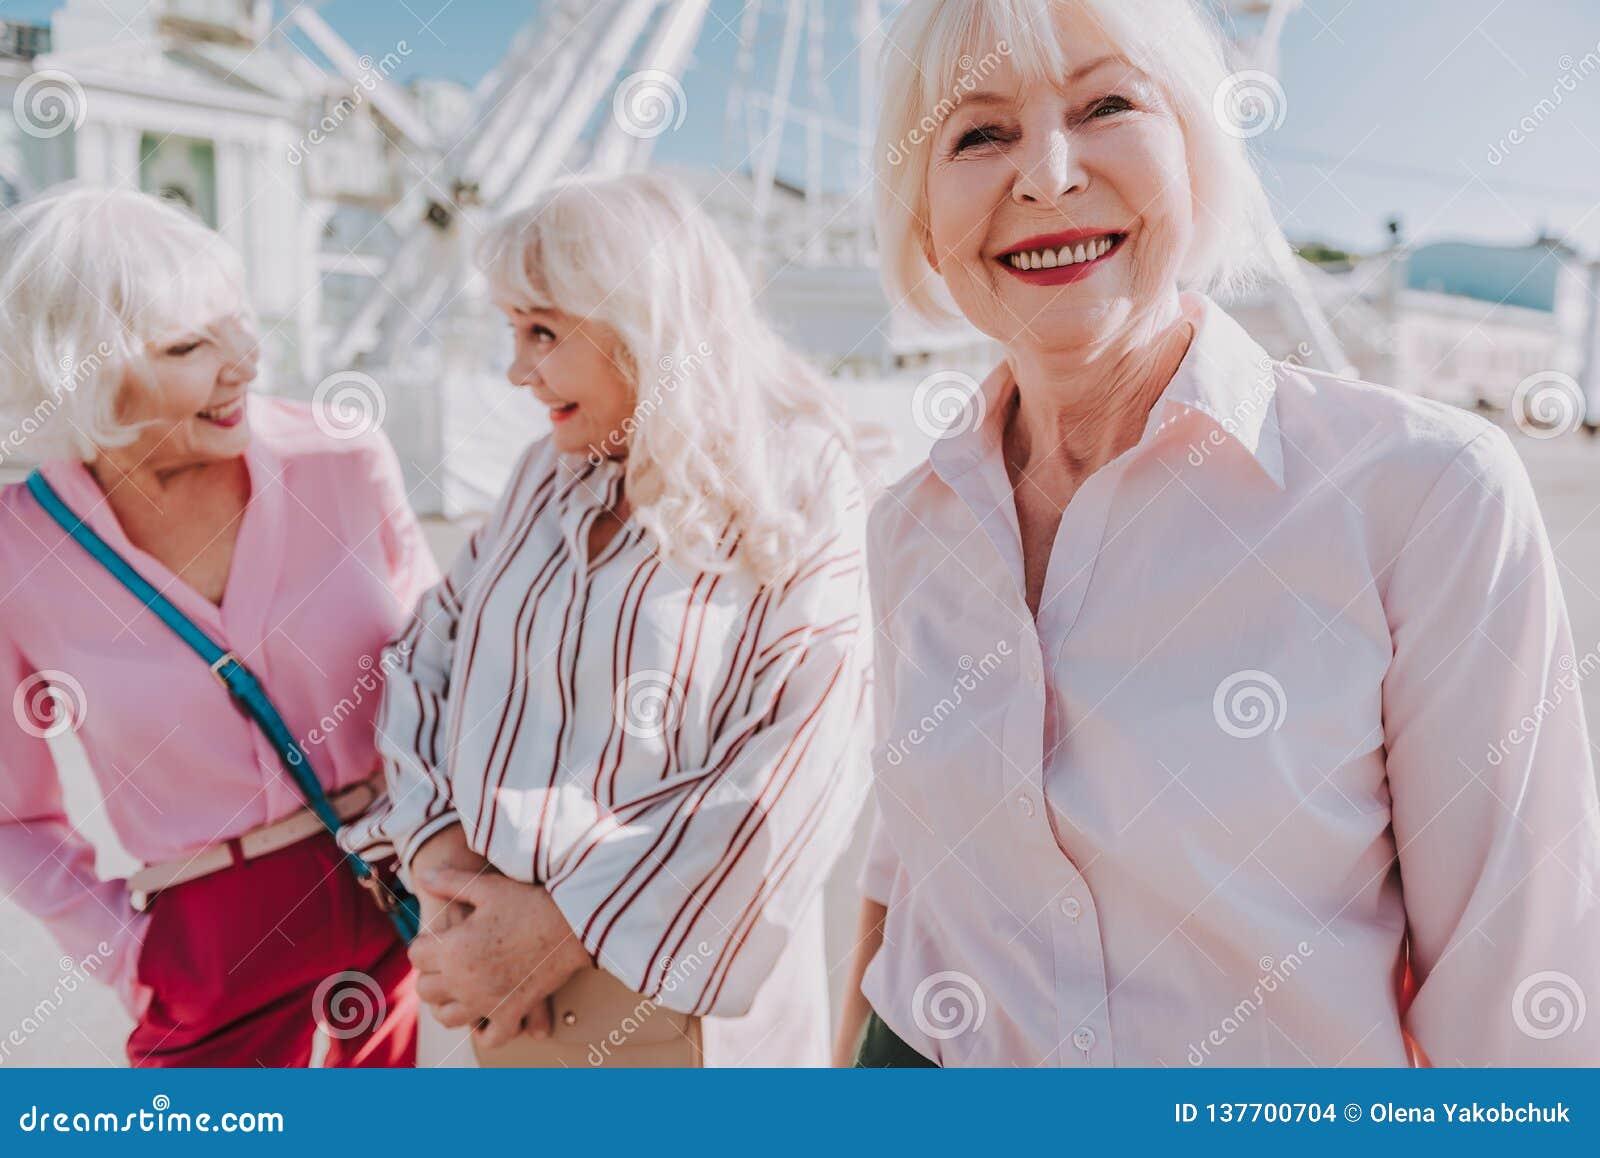 Agree, very older women fun